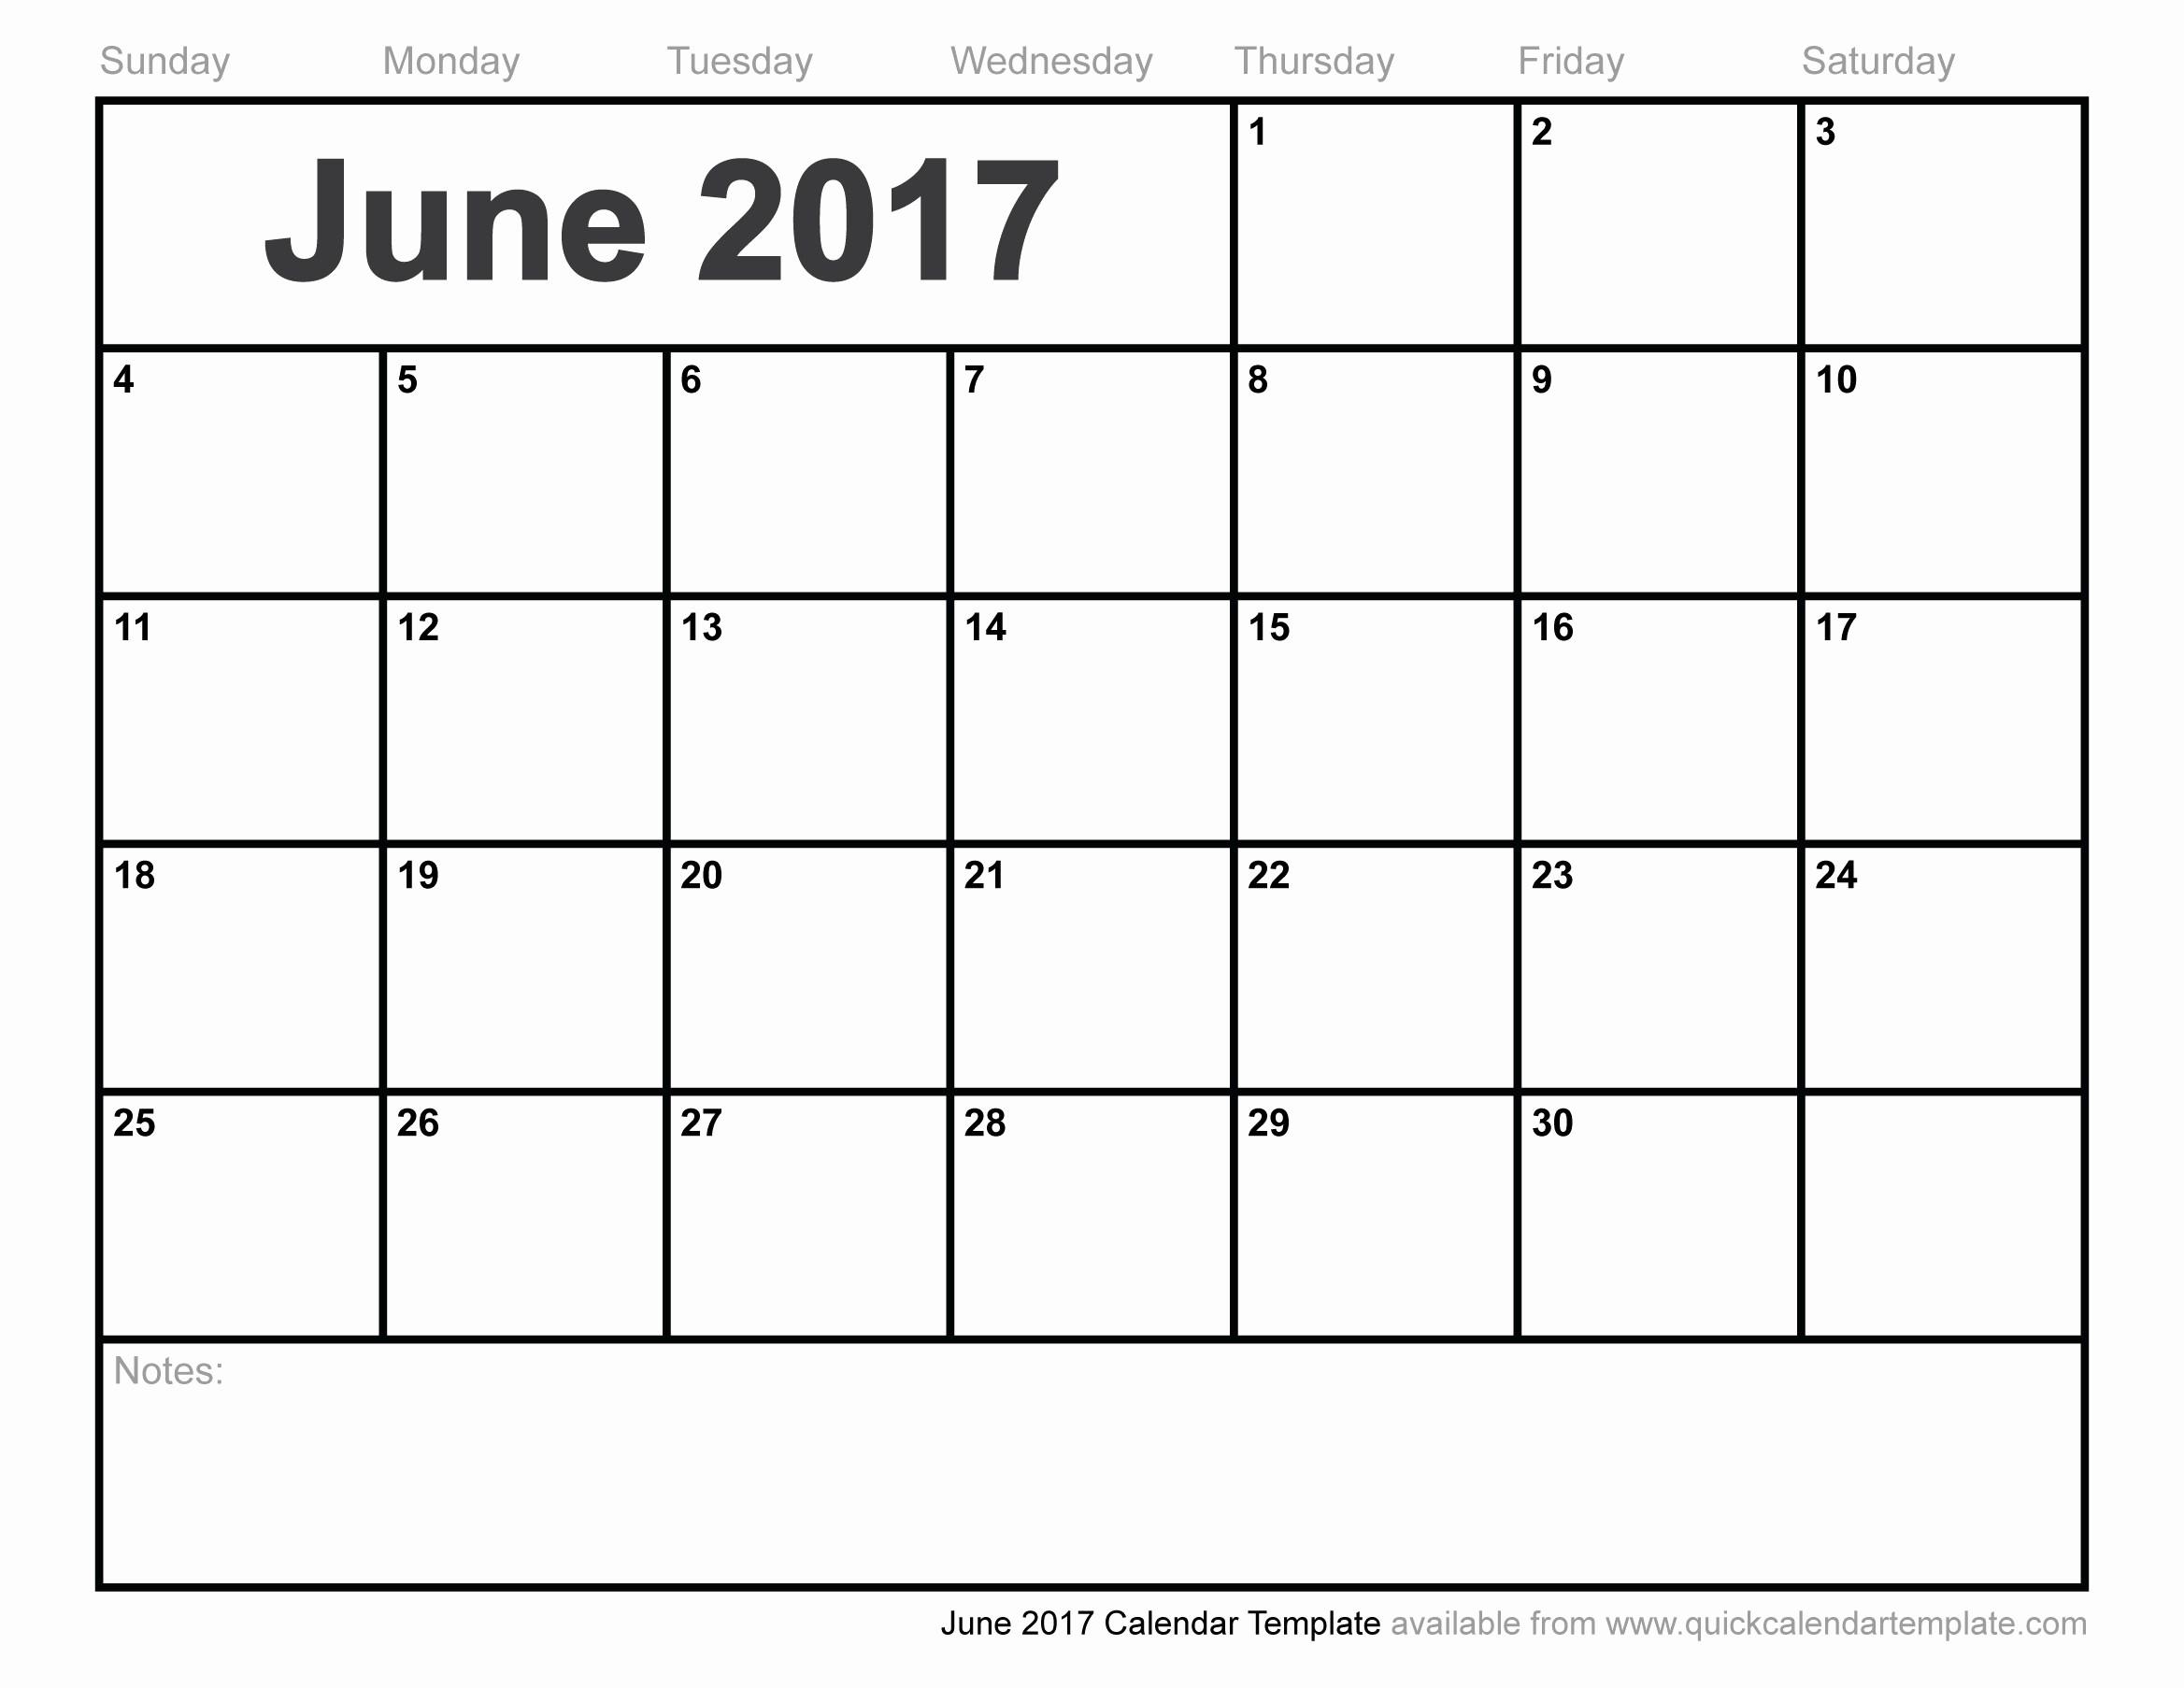 2017 Calendar Template Word Document Beautiful June 2017 Calendar Word